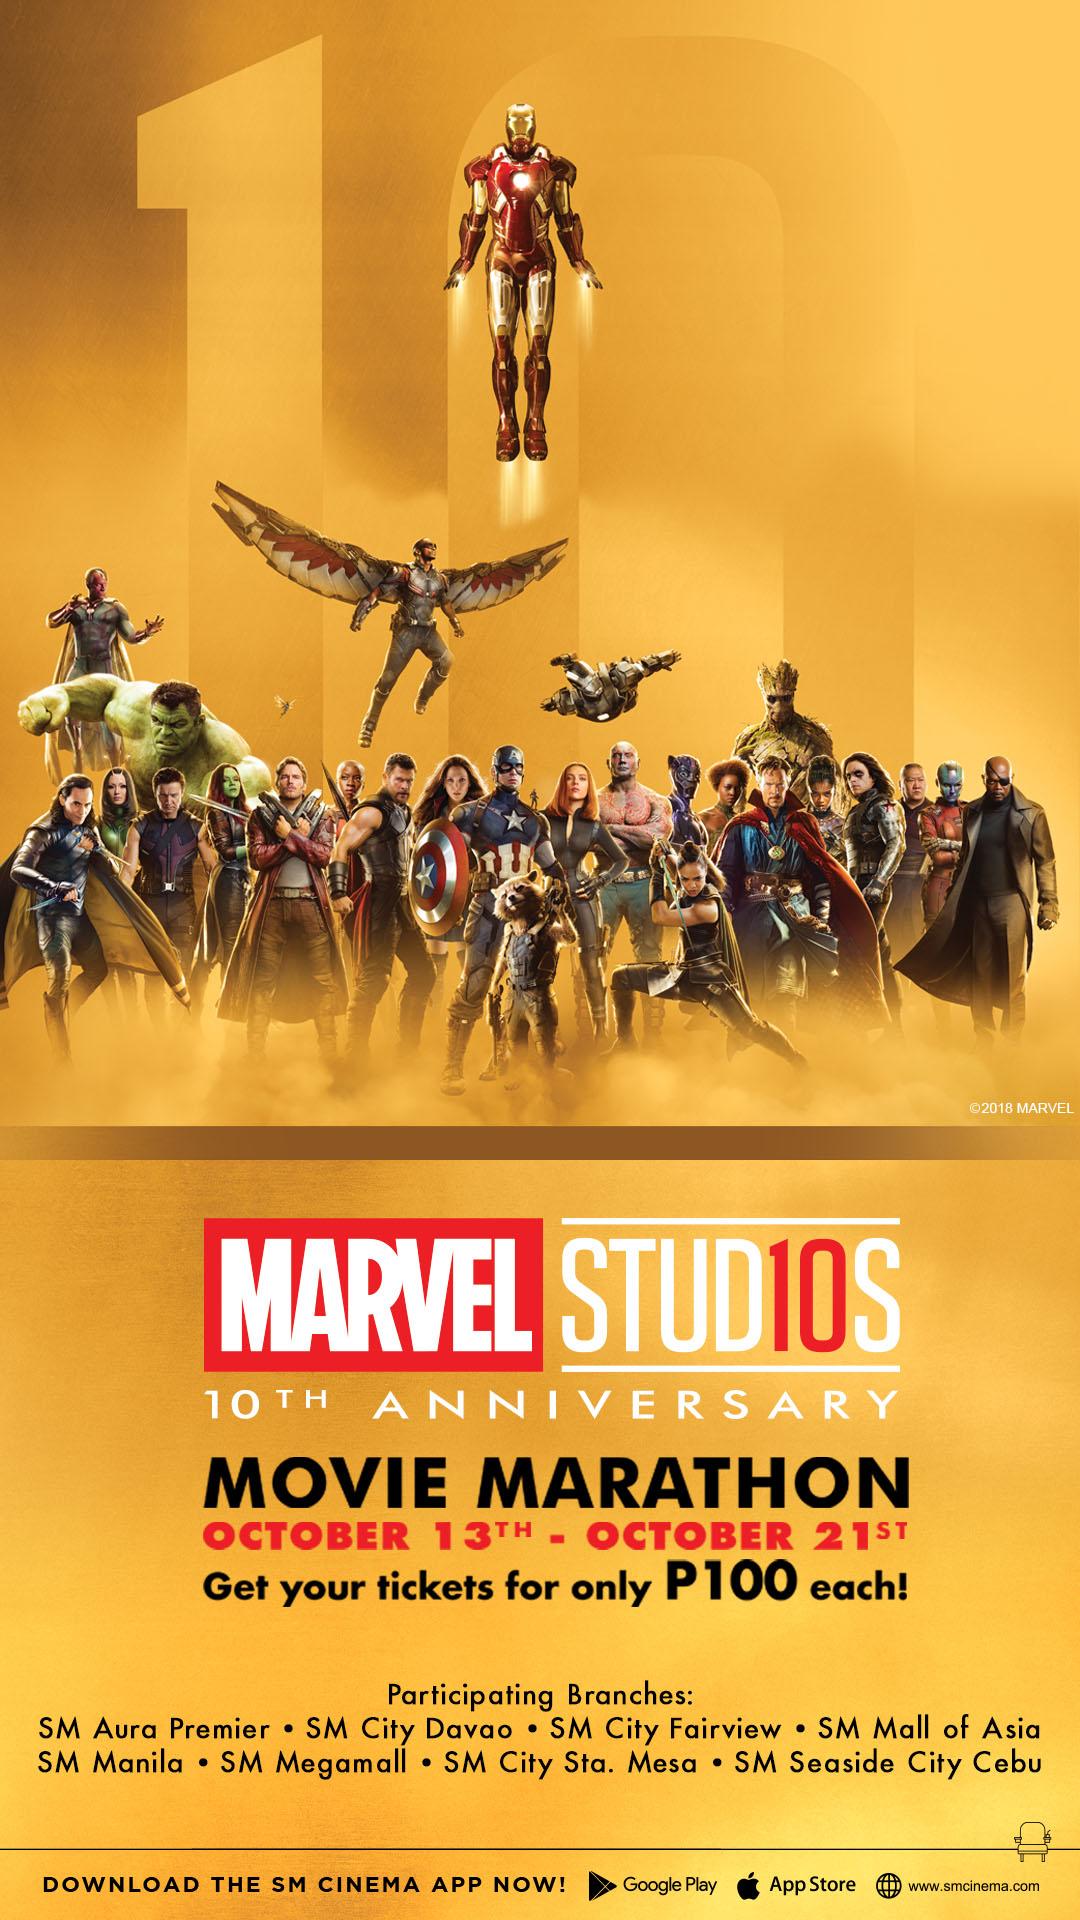 sm cinema presents the biggest marvel movie marathon ever! | raincheck